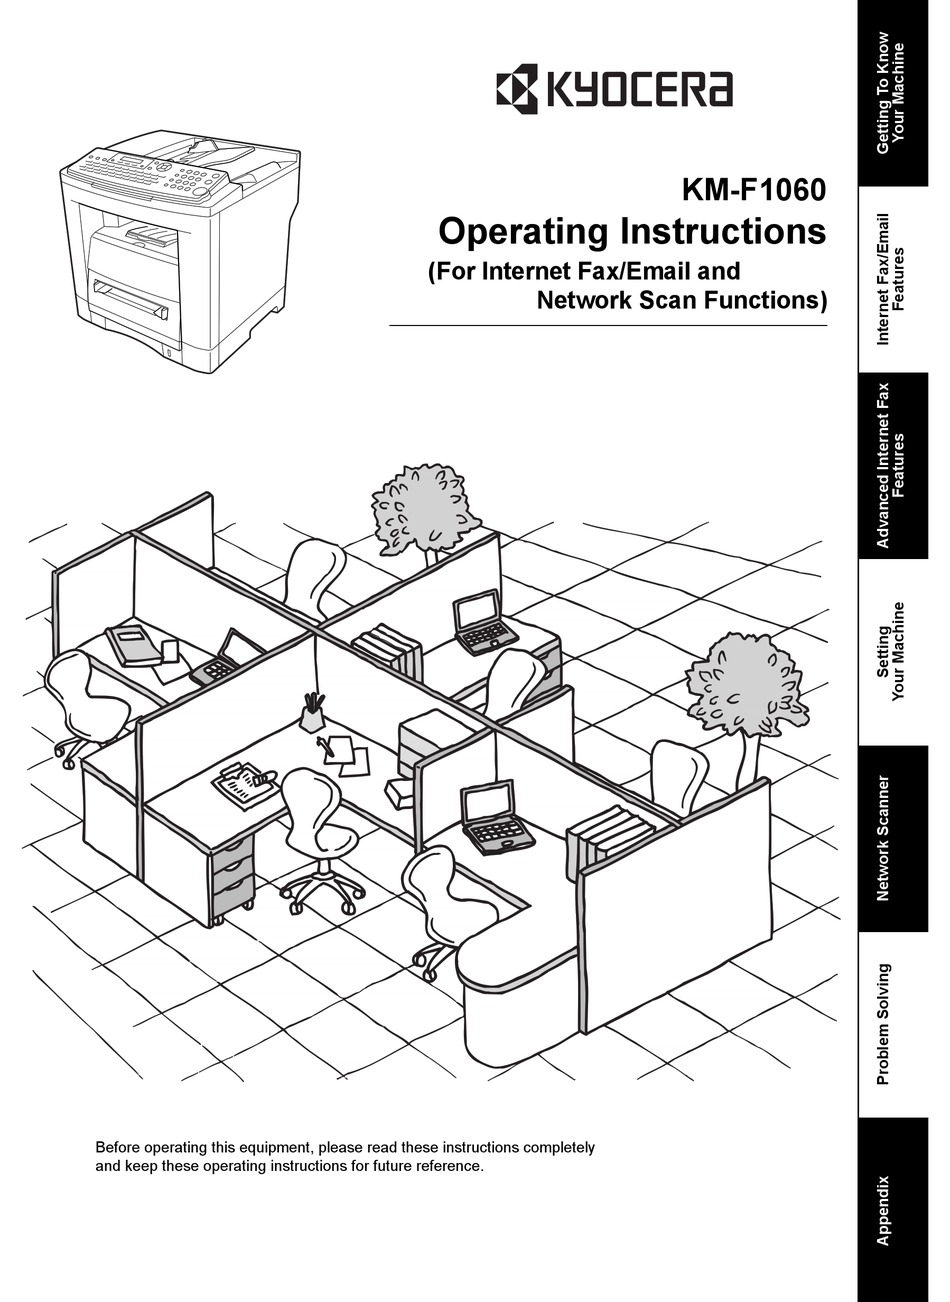 KYOCERA KM-F1060 OPERATING INSTRUCTIONS MANUAL Pdf